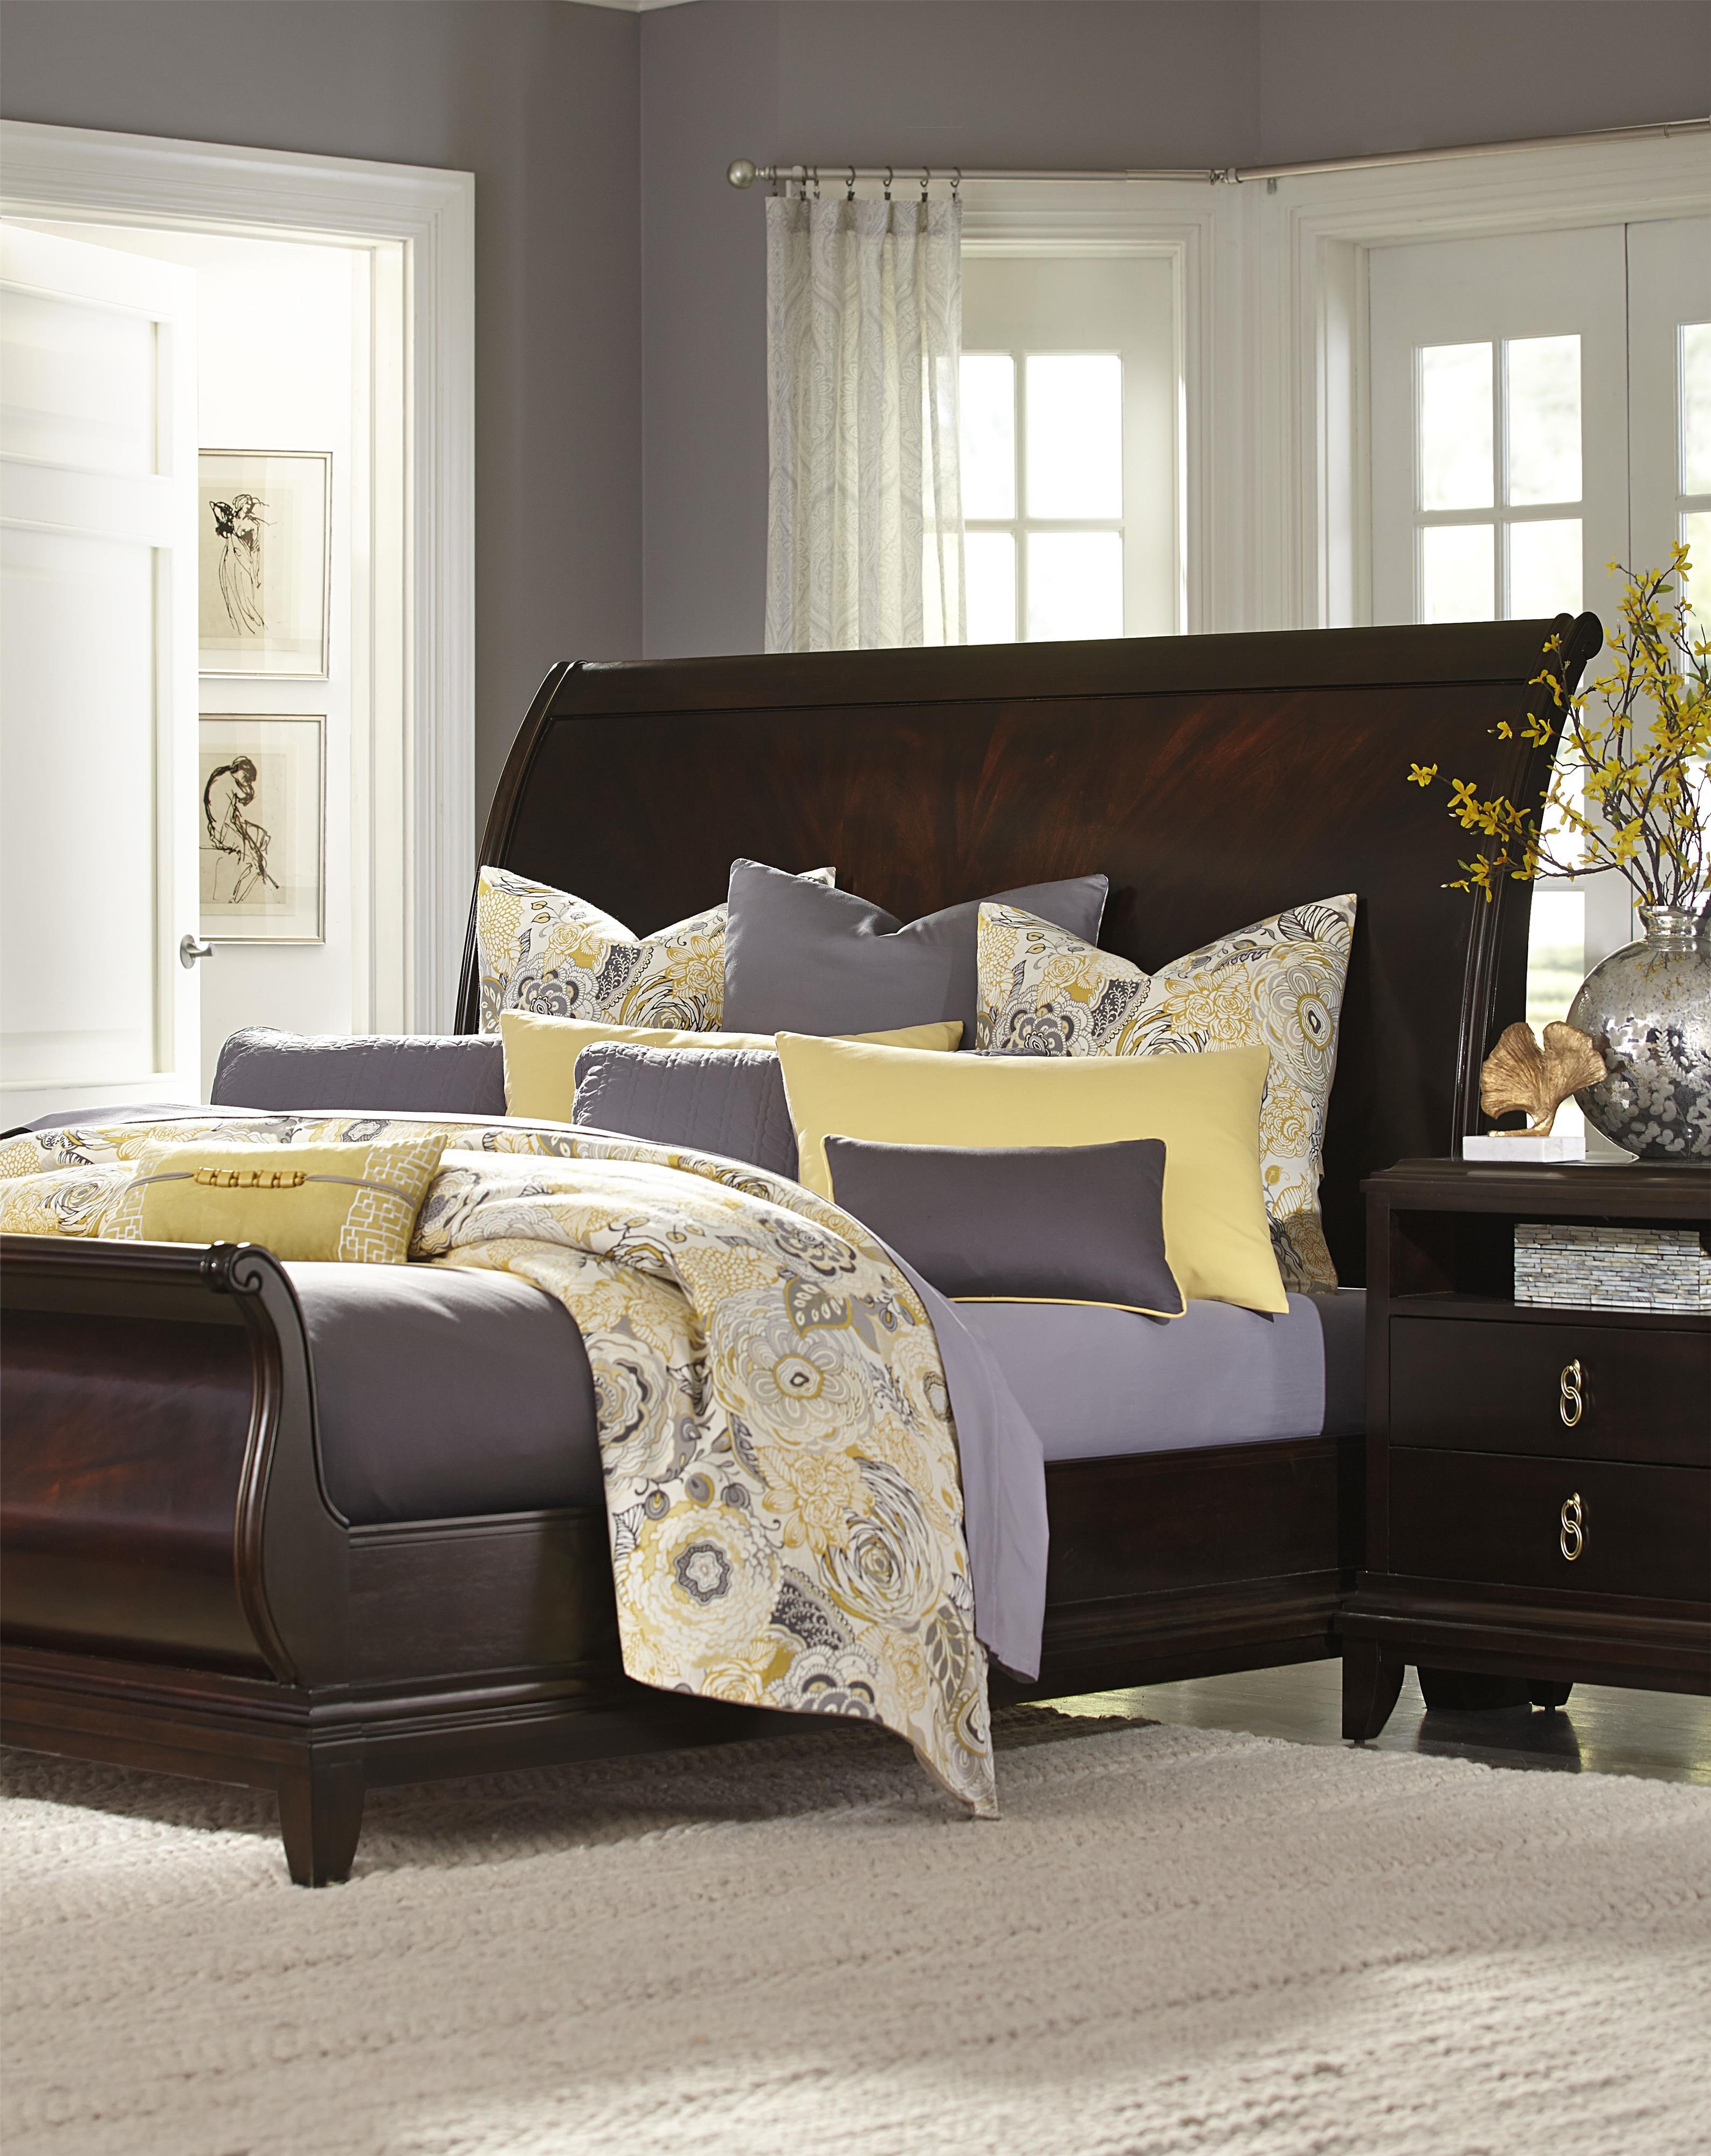 Legacy Classic Sophia California King Bedroom Group 2 - Item Number: 4450 CK Bedroom Group 2